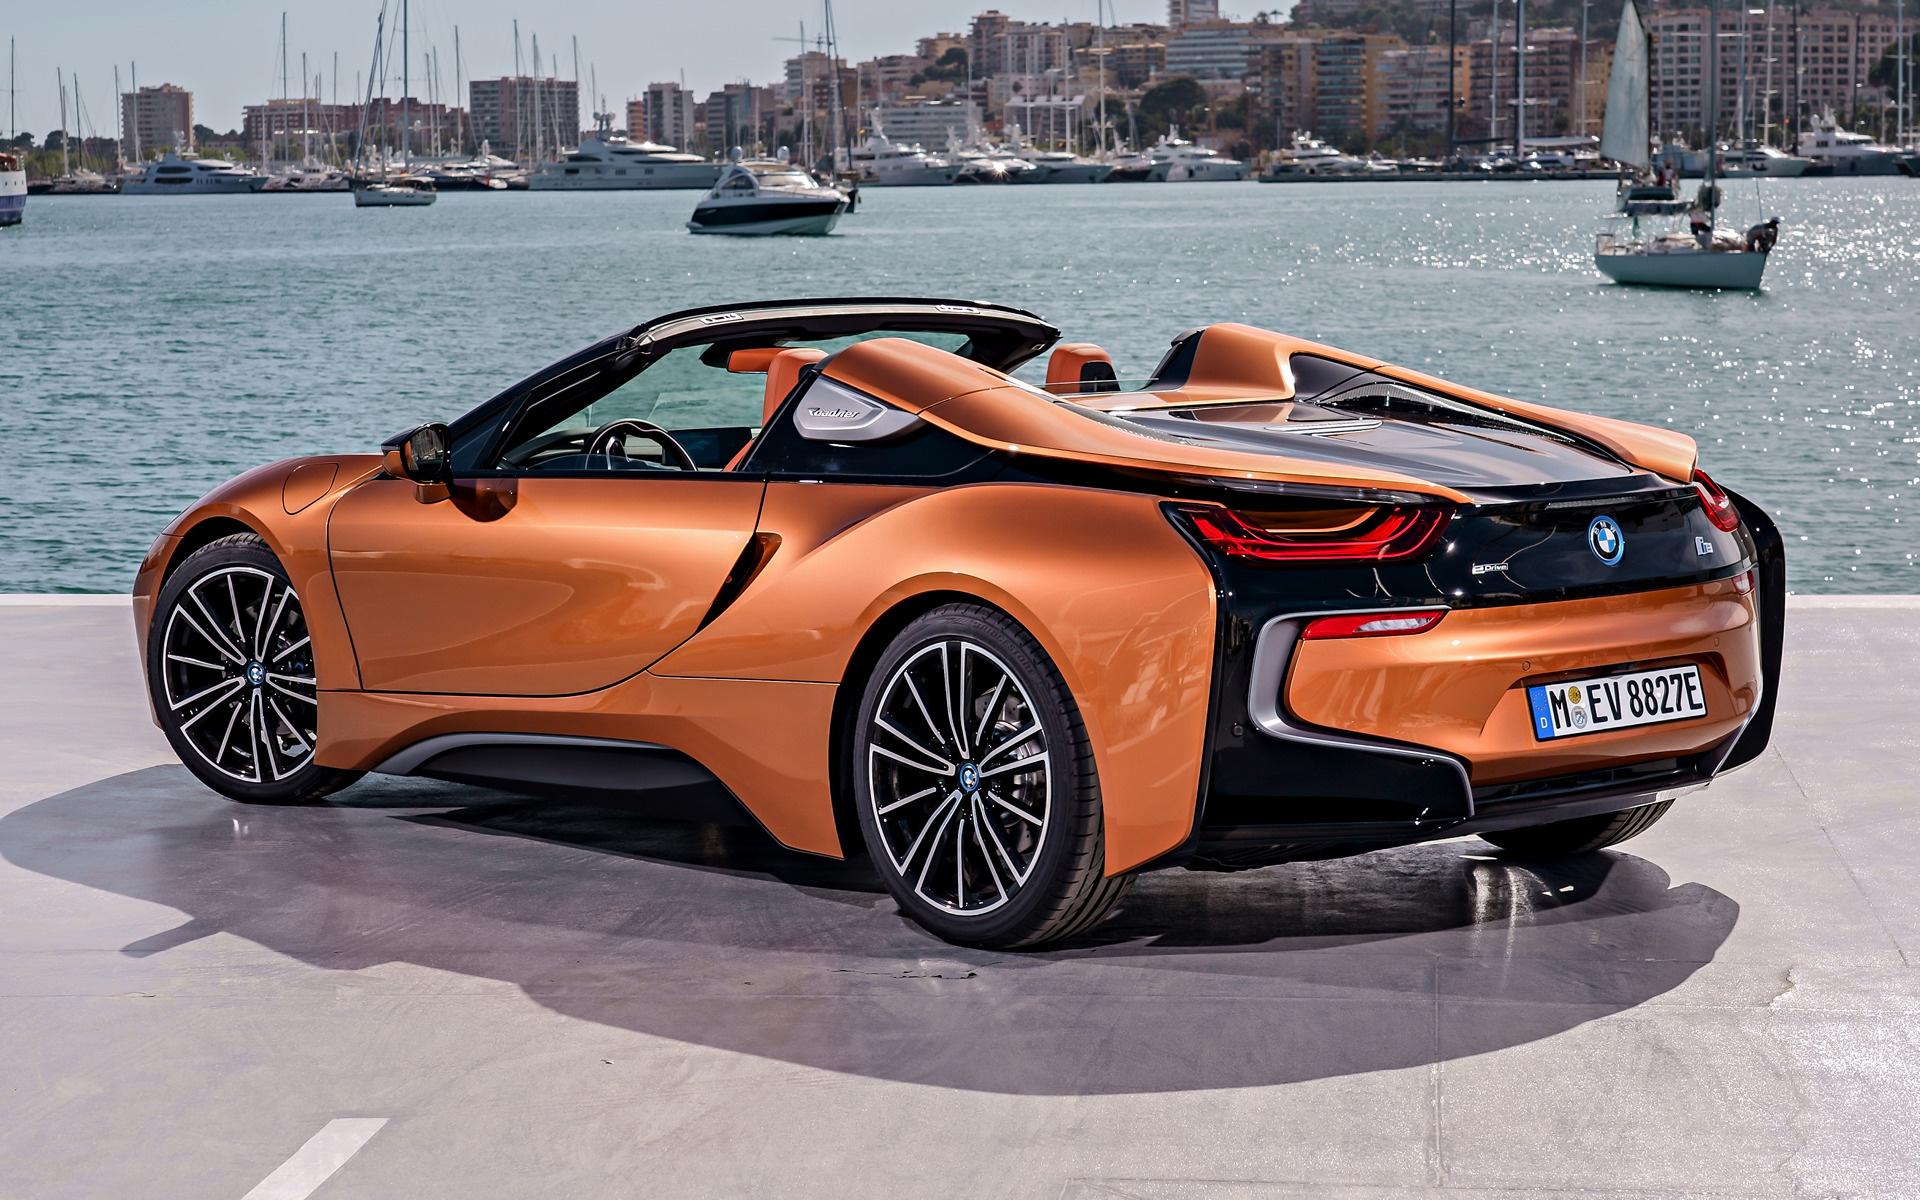 Orange Dodge Ram >> 2018 BMW i8 Roadster - Wallpapers and HD Images | Car Pixel